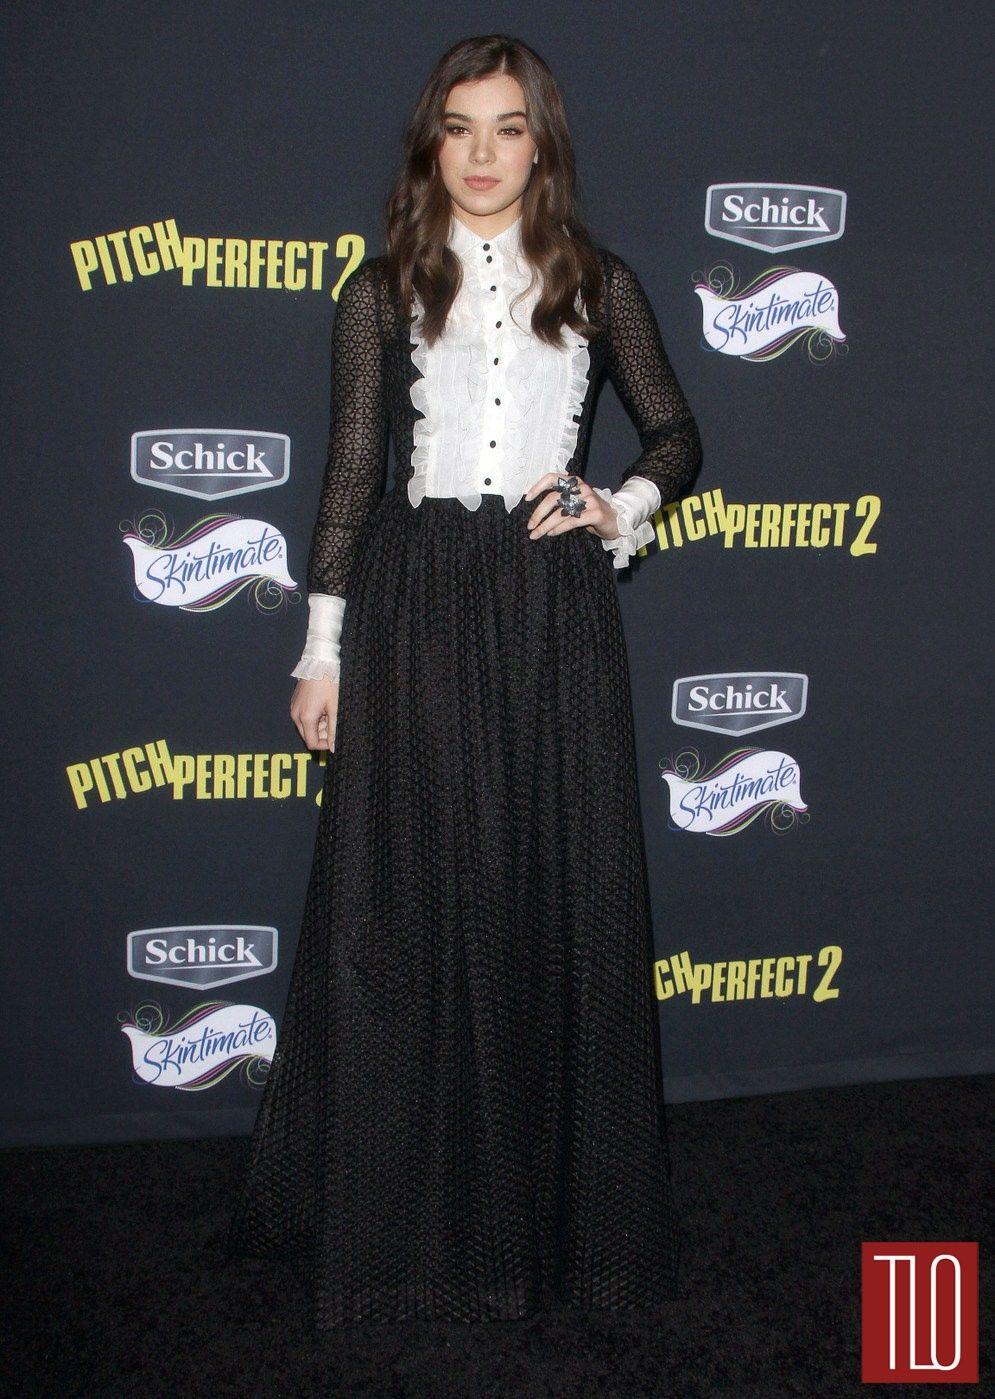 3b888c4a9 Hailee-Steinfeld-Pitch-Perfect-2-Los-Angeles-Movie-Premiere-Red-Carpet-Fashion-Dolce-Gabbana-Tom-Lorenzo-Site-TLO  (1)